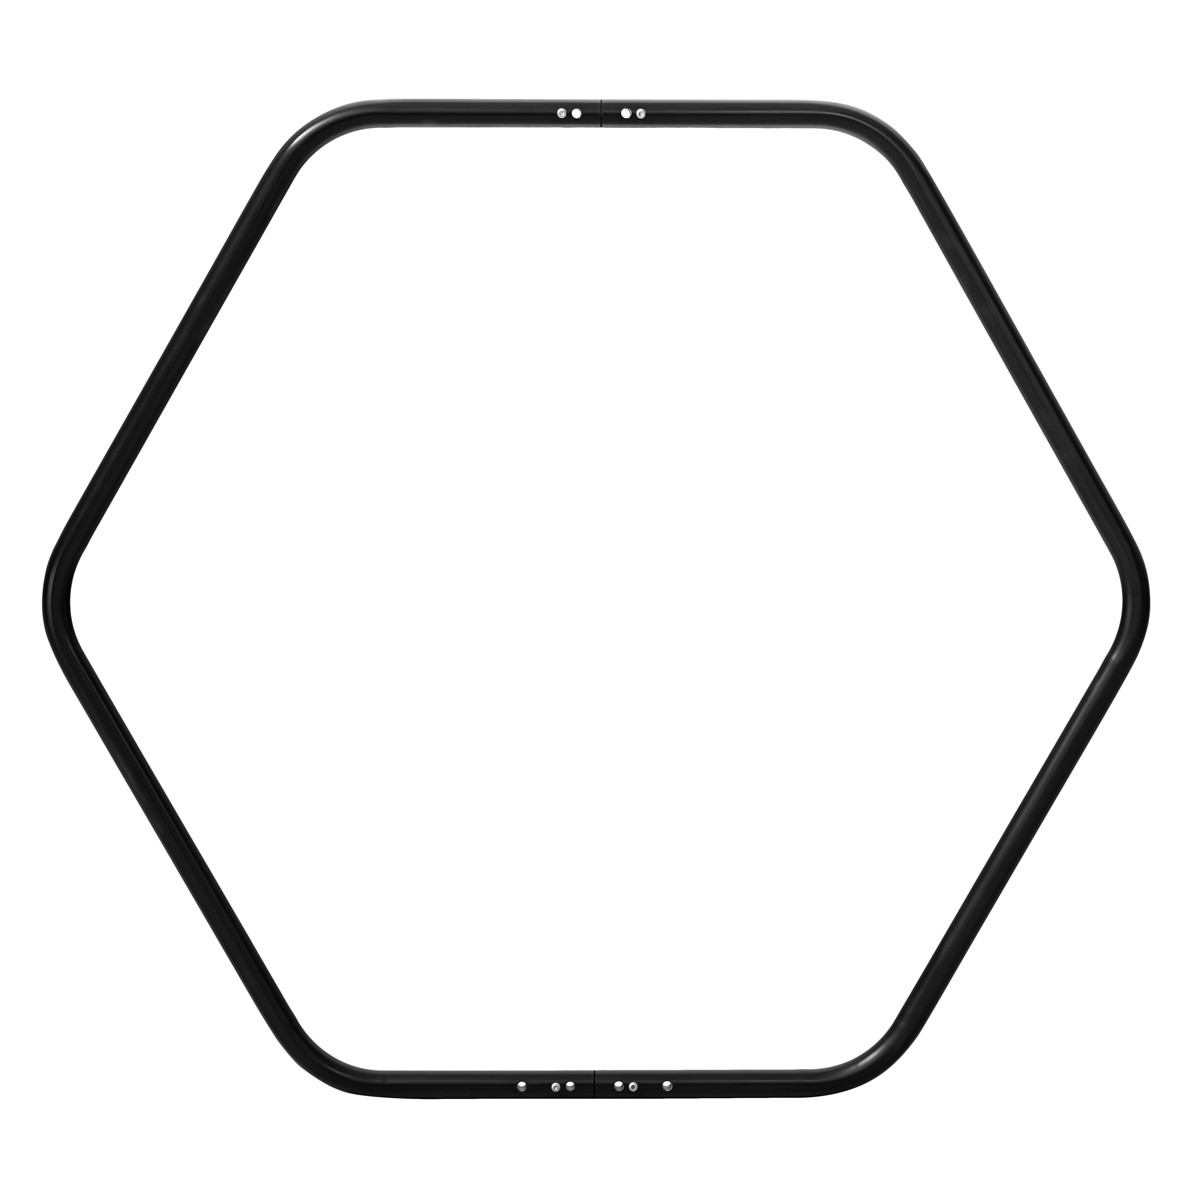 Divisible Aerial Hexagon